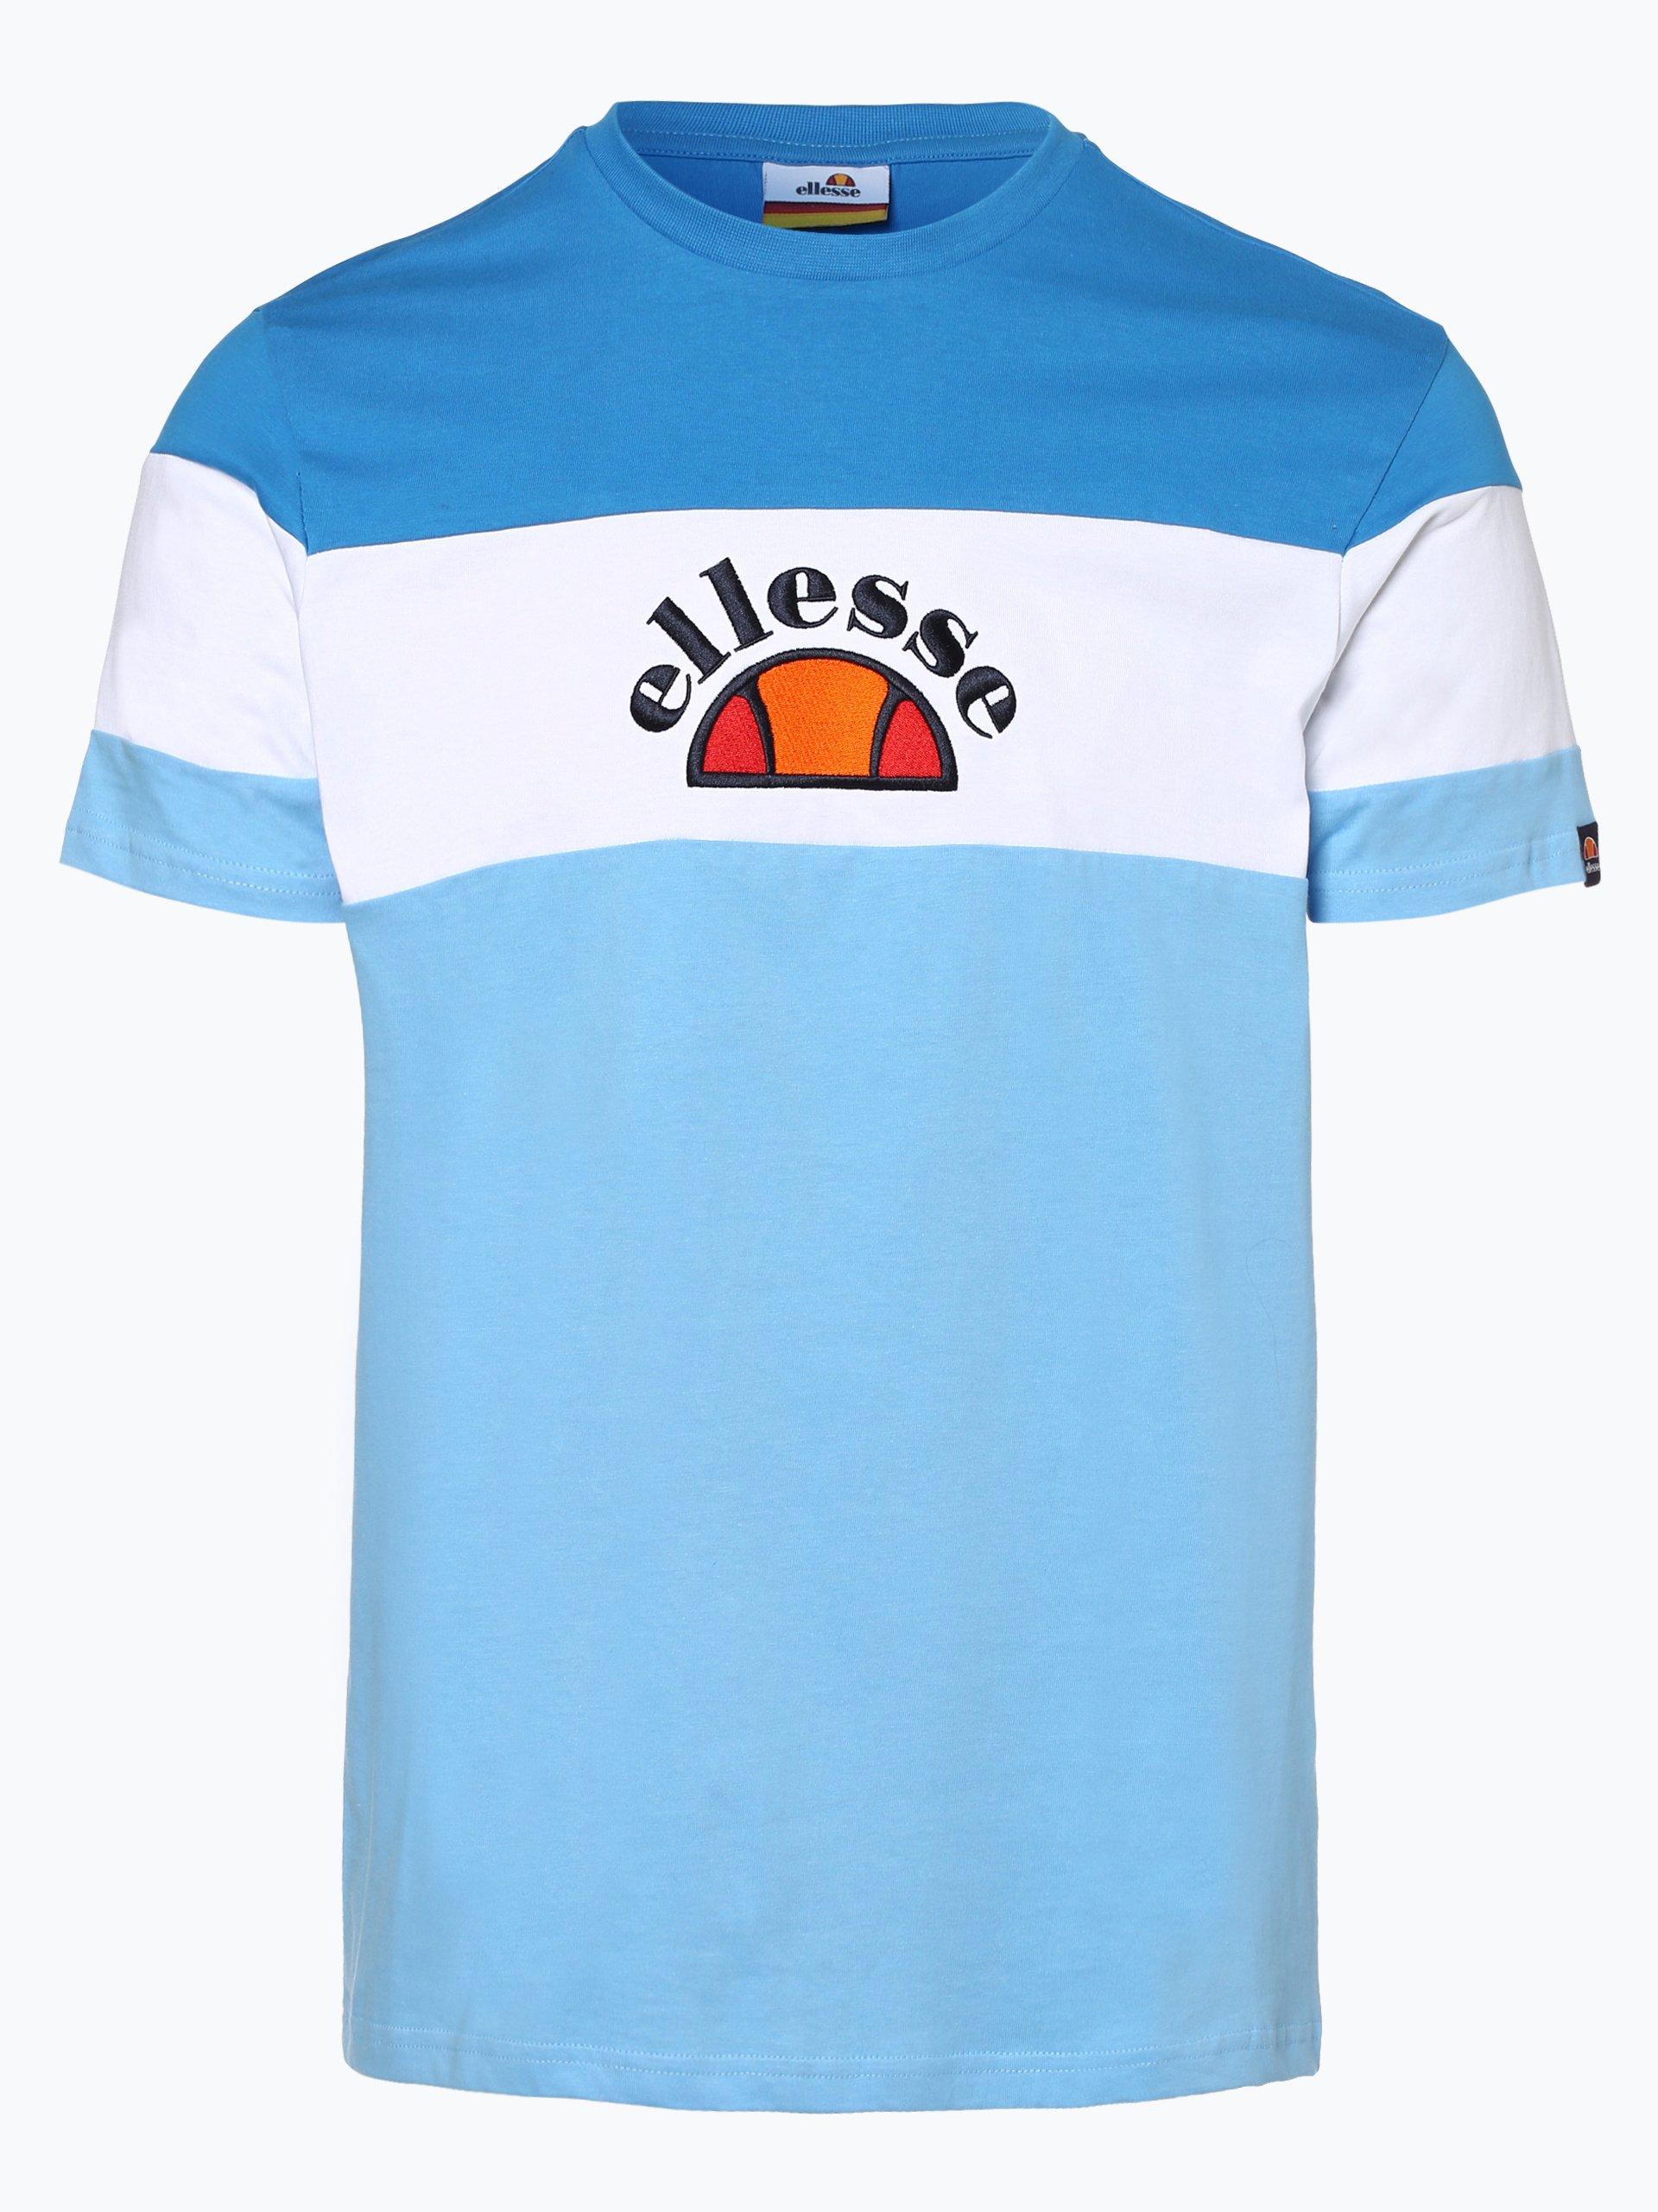 ellesse Herren T-Shirt - Gubbio